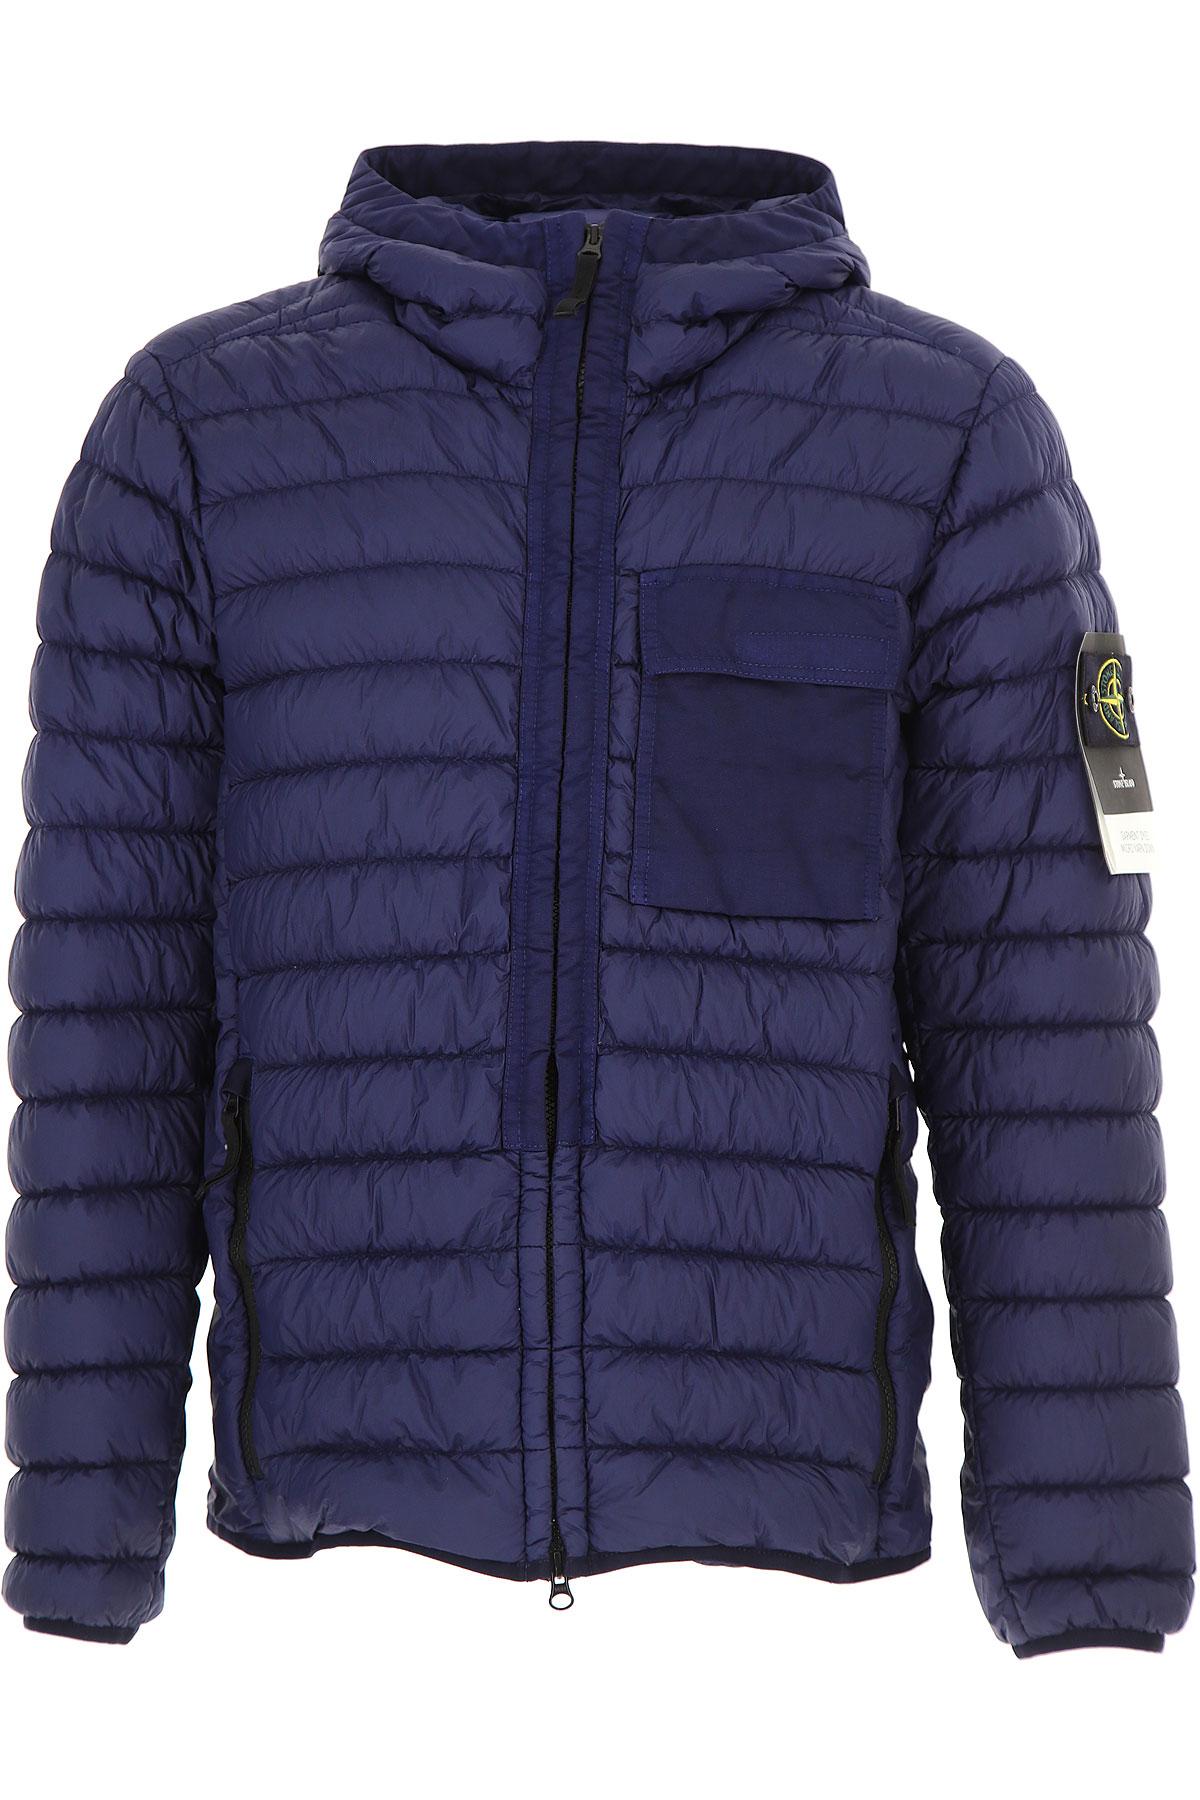 Image of T-Jacket Blazer for Men, Sport Coat, Ink, Cotton, 2017, L M XL